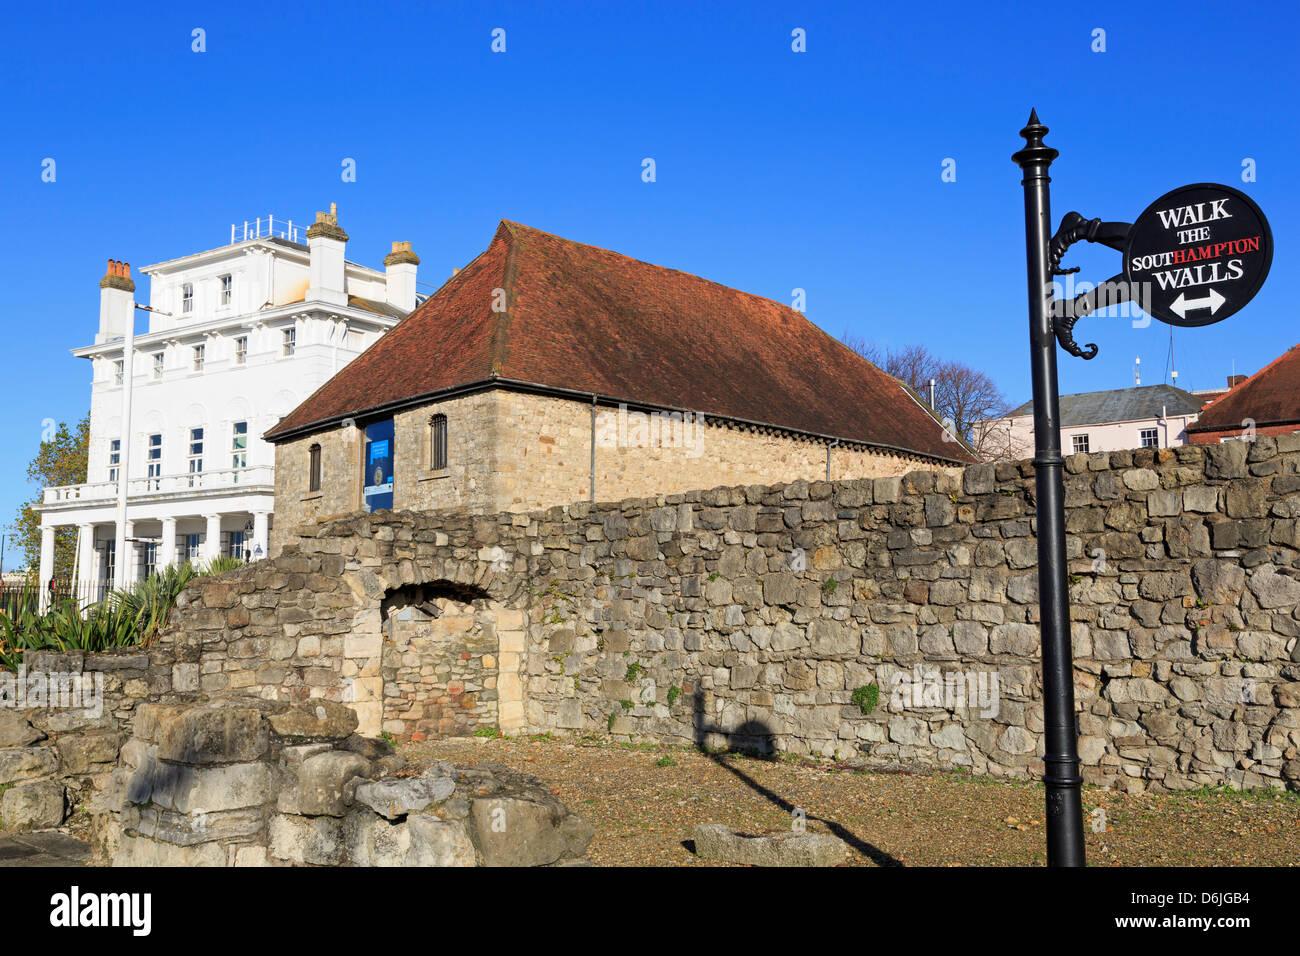 The Wool House, Southampton, Hampshire, England, United Kingdom, Europe - Stock Image